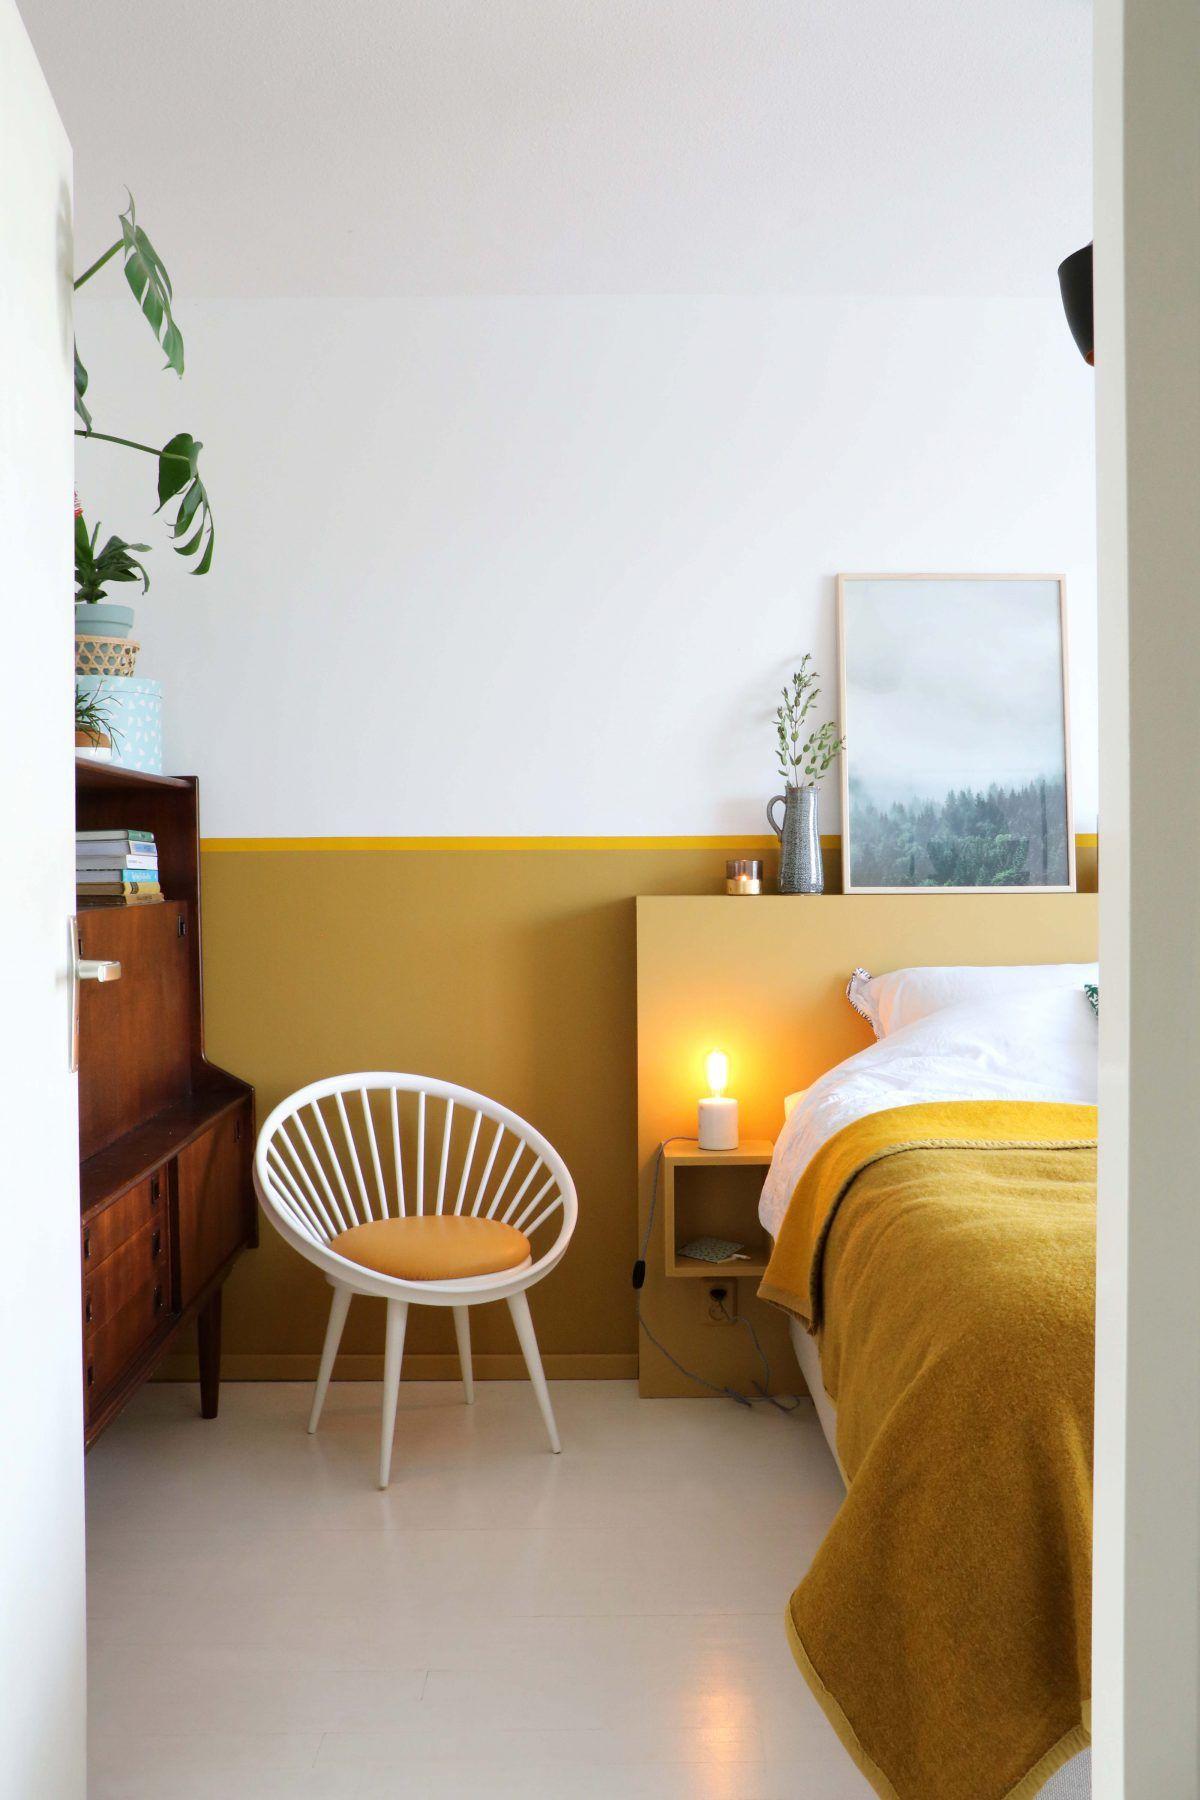 Hoofdbord slaapkamer bedroom appartement maison en lit for Slaapkamer bed